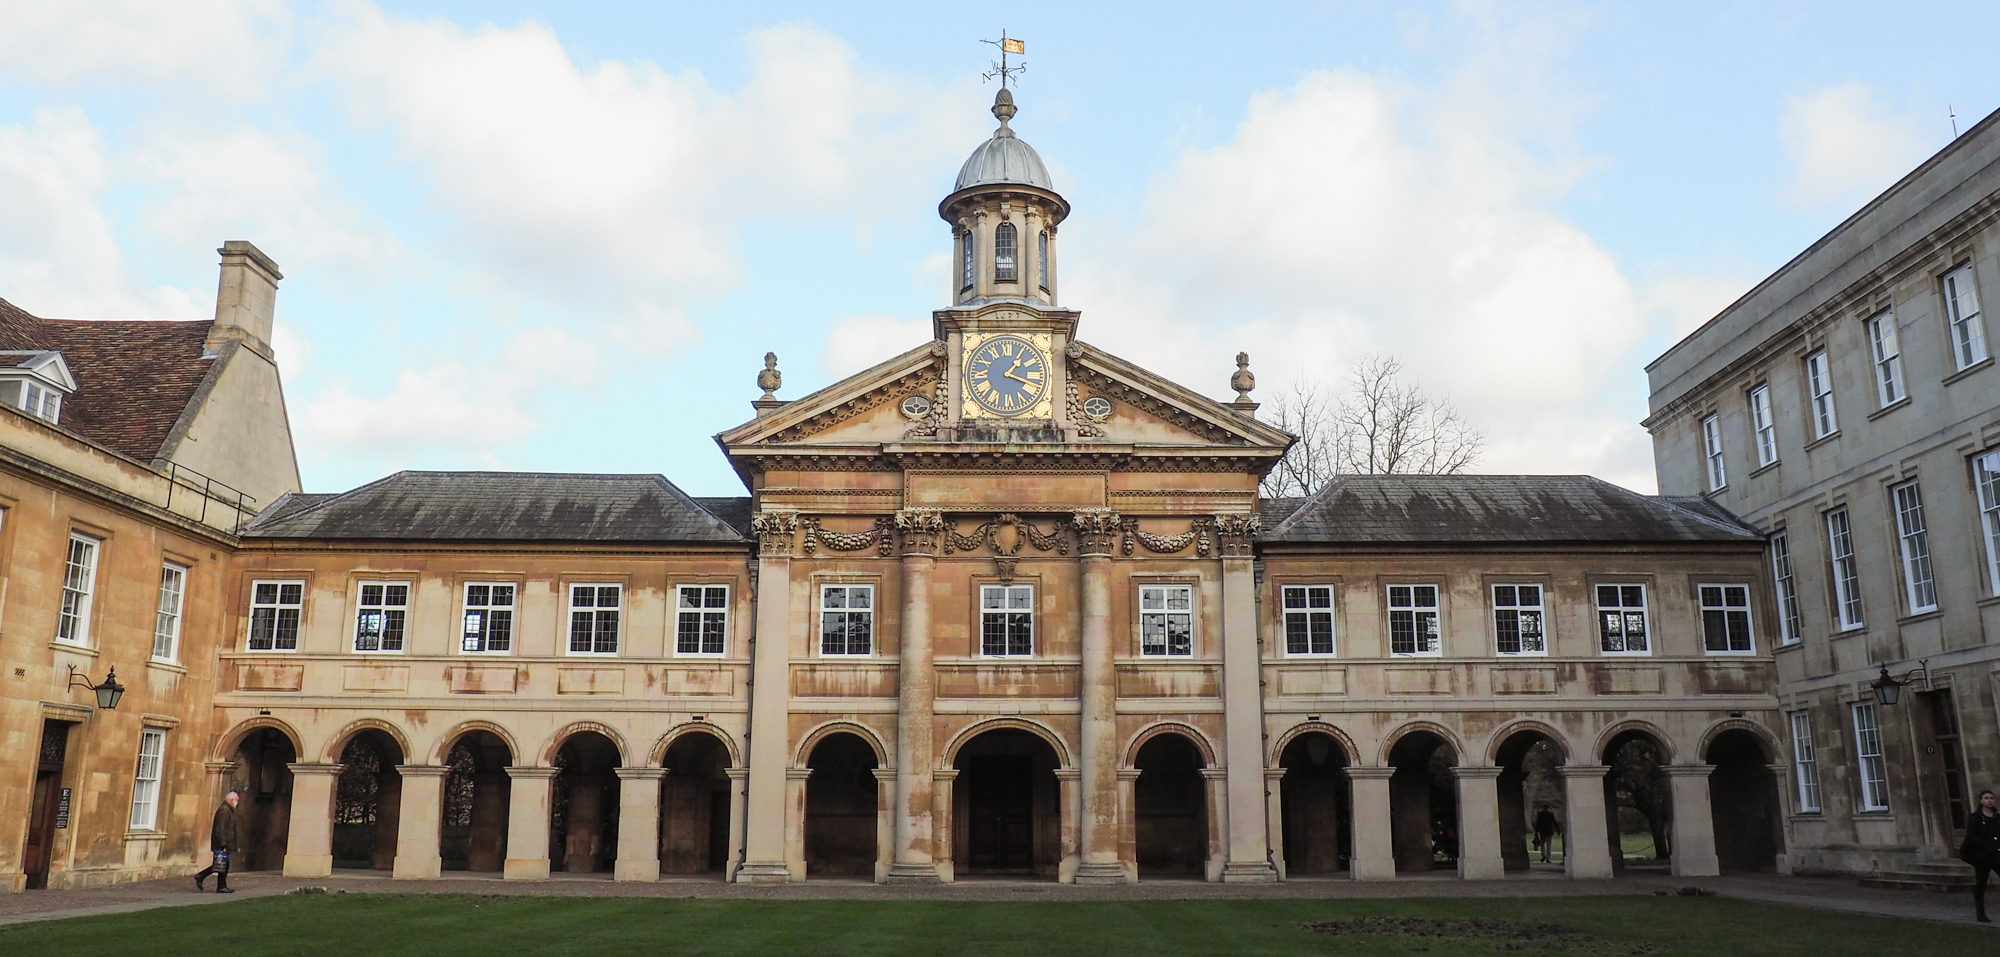 Emmanuel College Cambridge